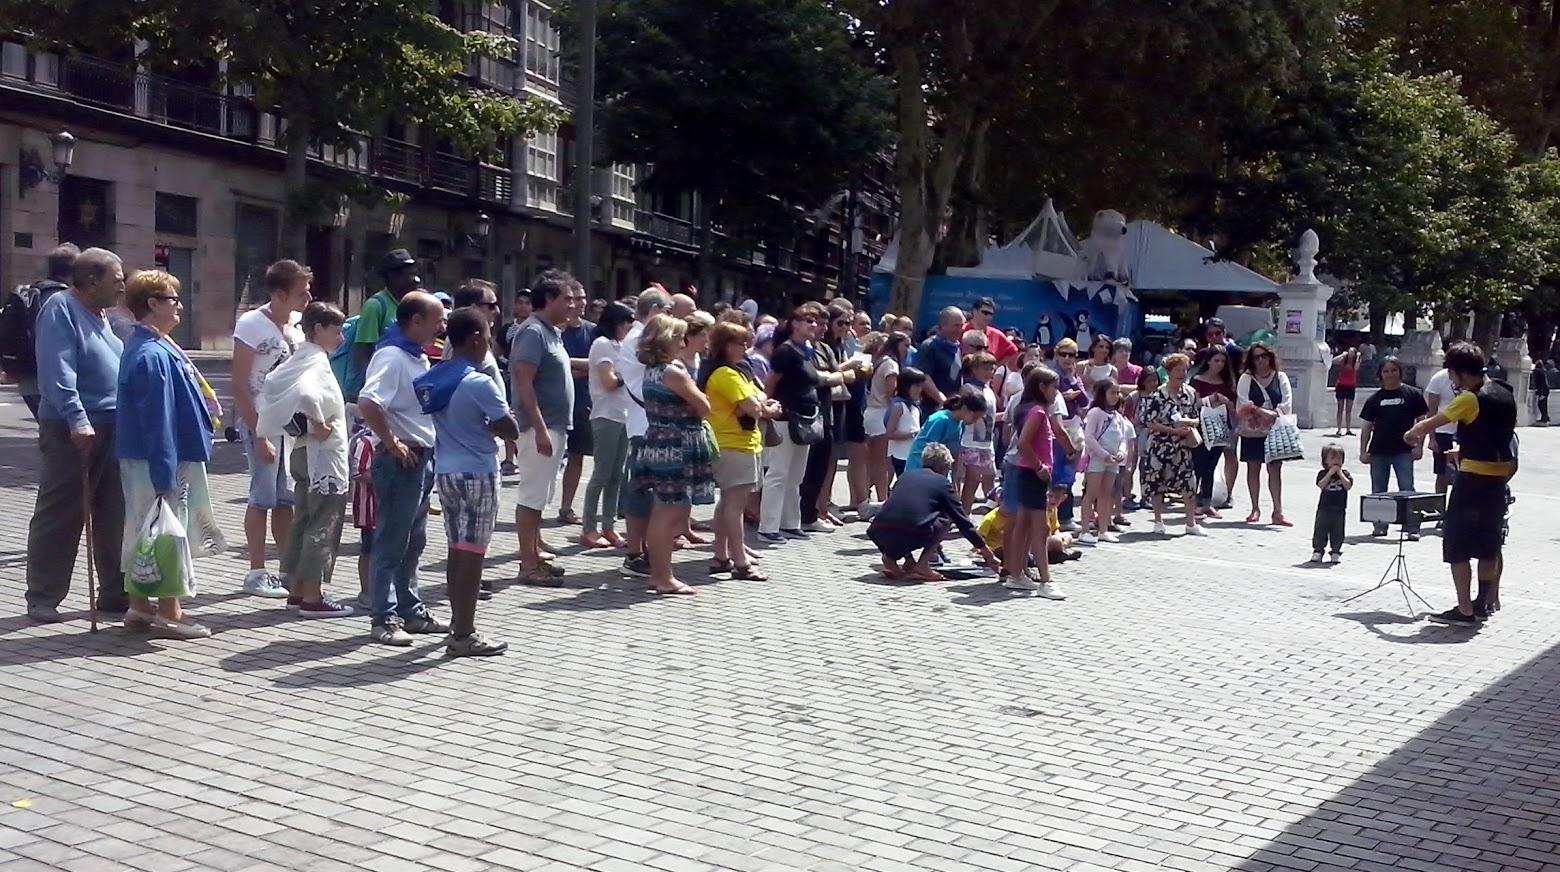 mago en calle de Bilbao 2015